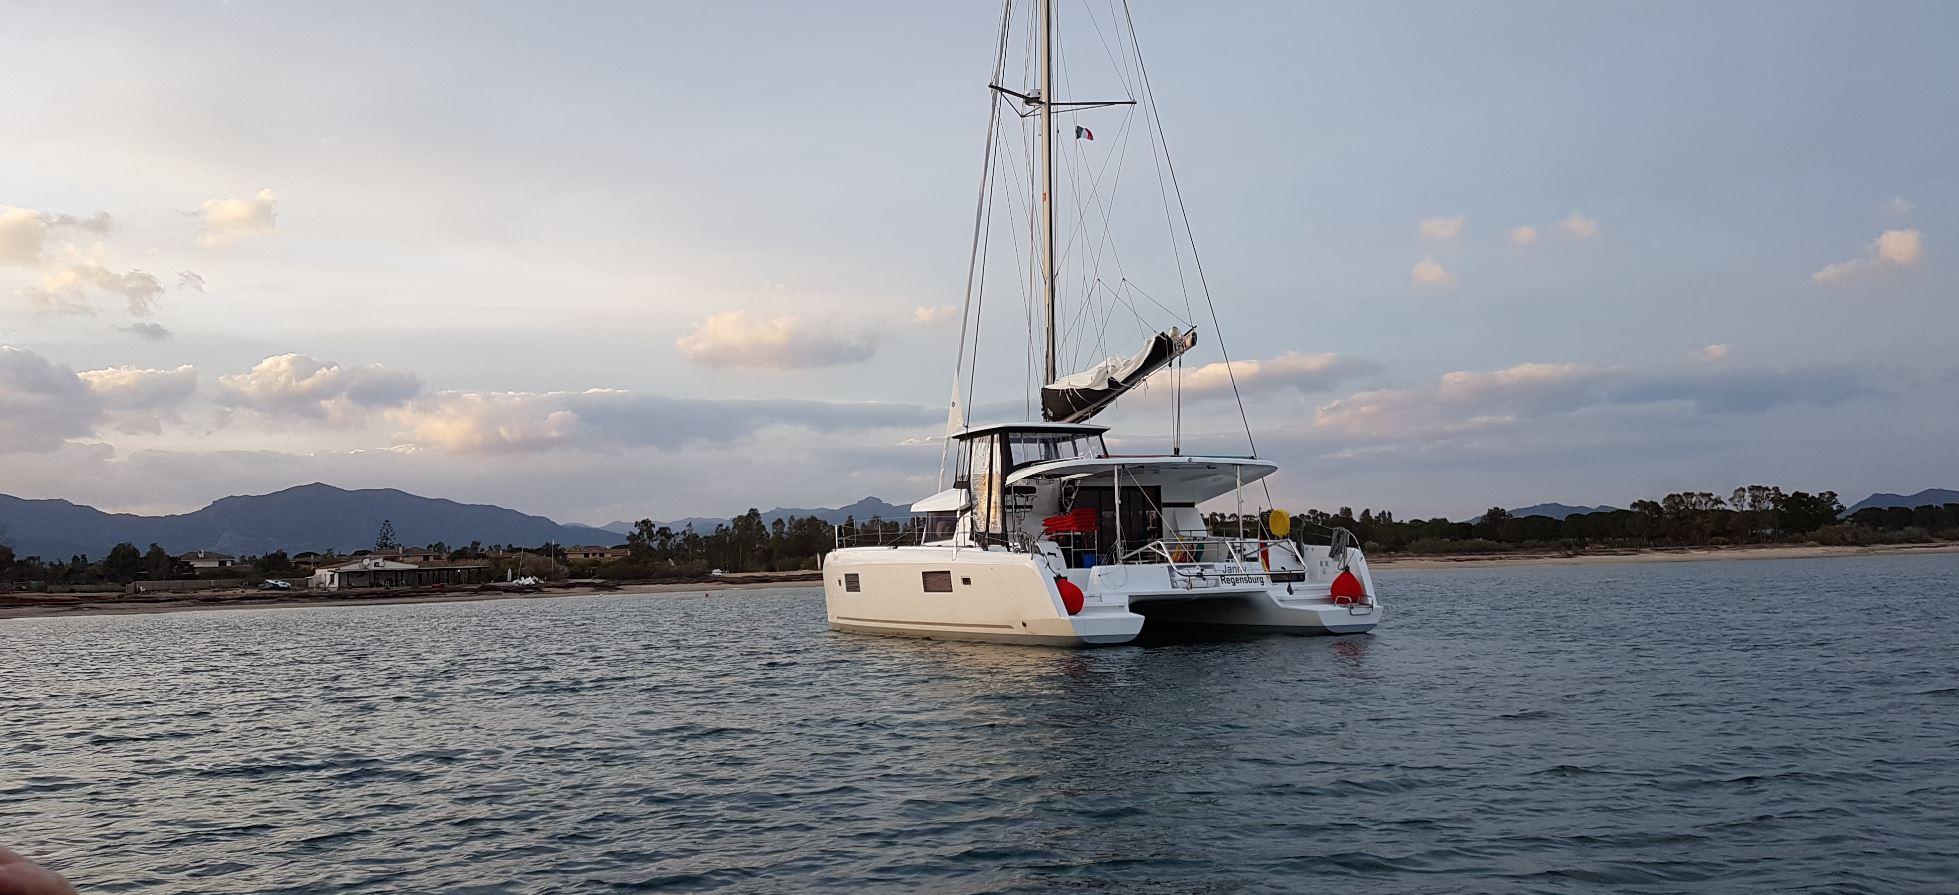 Weihnachten Segel Urlaub Teneriffa auf Katamaran Lagoon 42